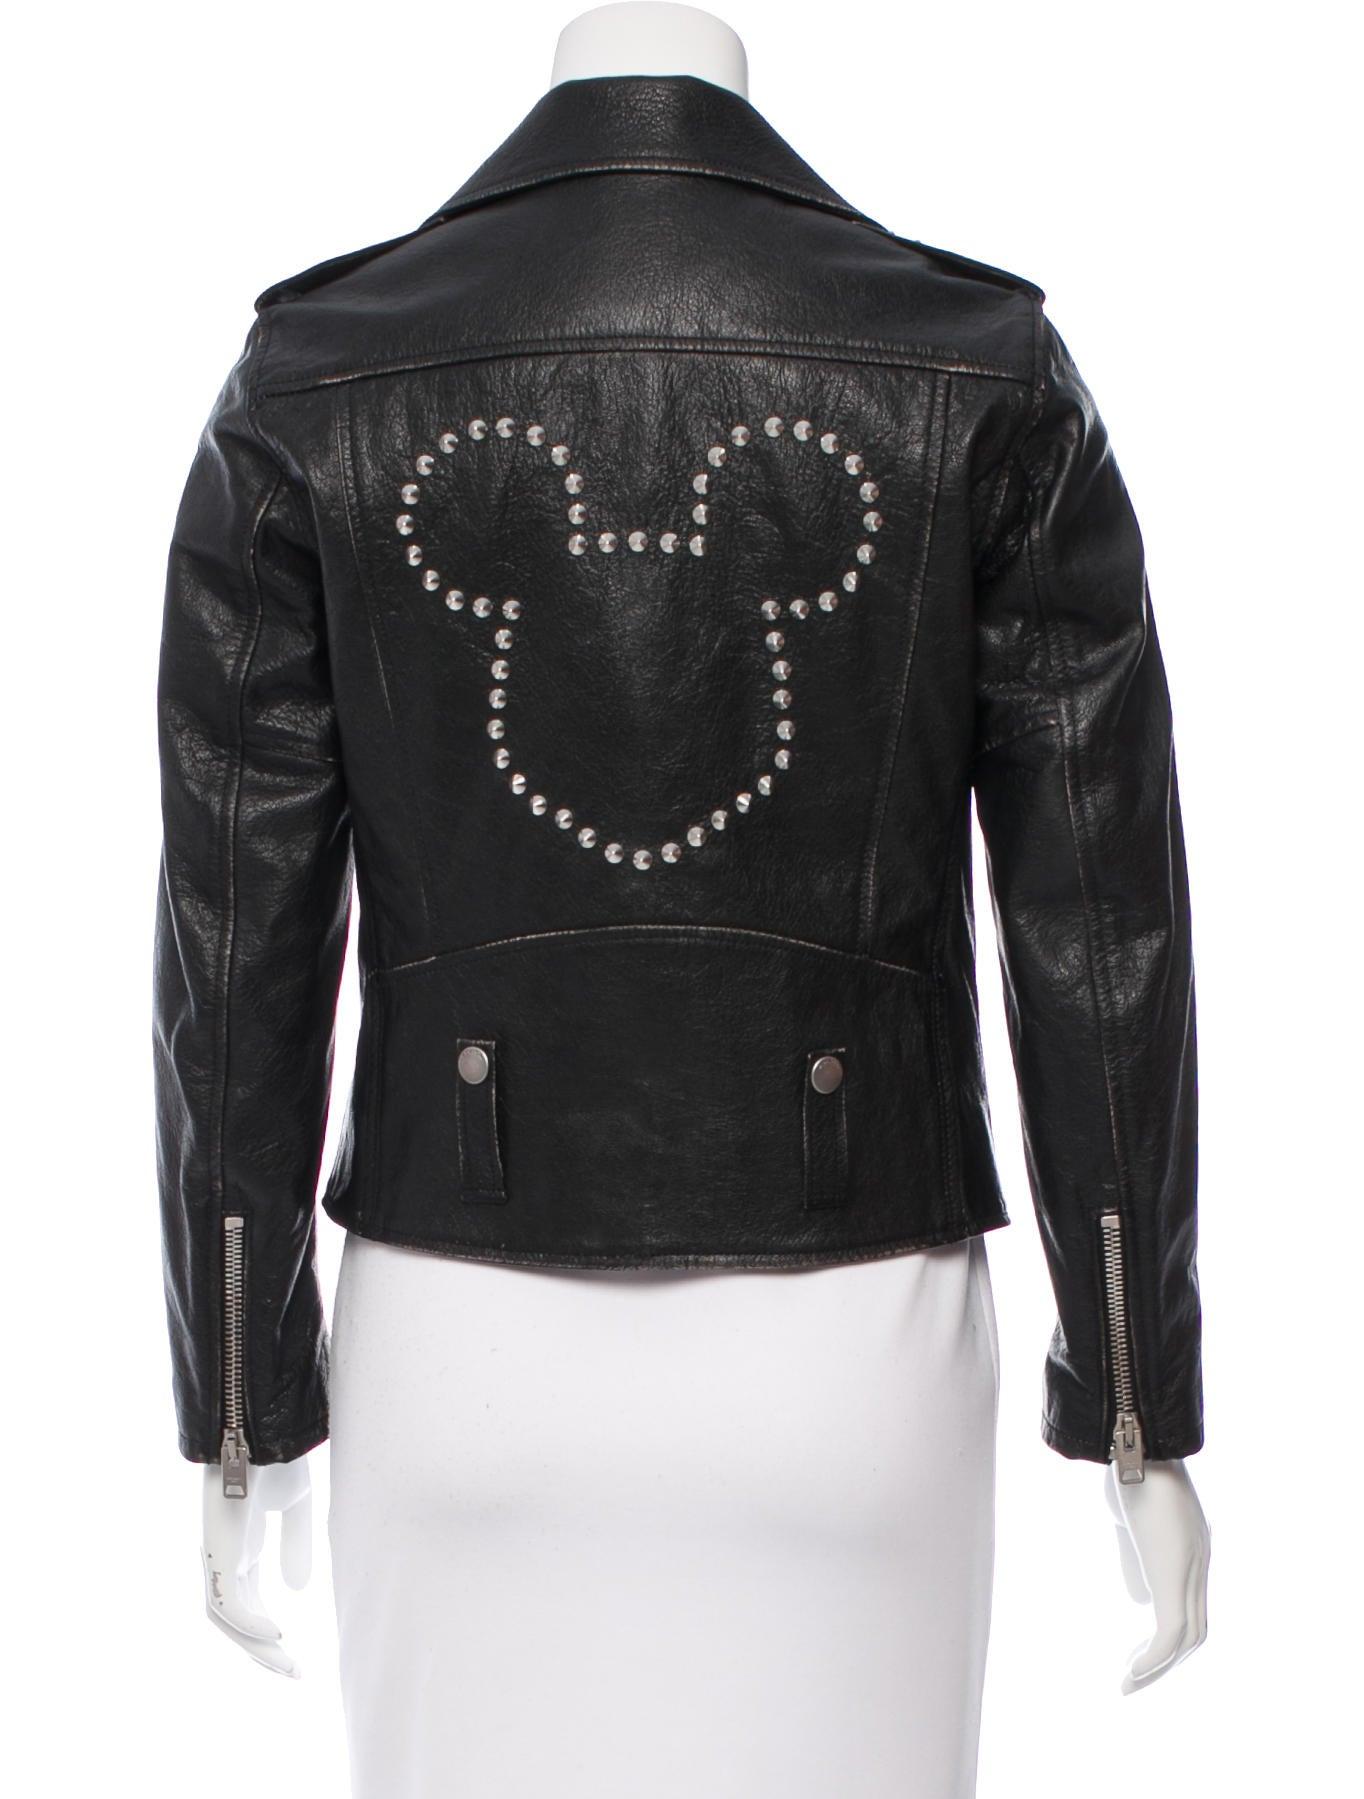 Coach 1941 Mickey Leather Jacket w/ Tags